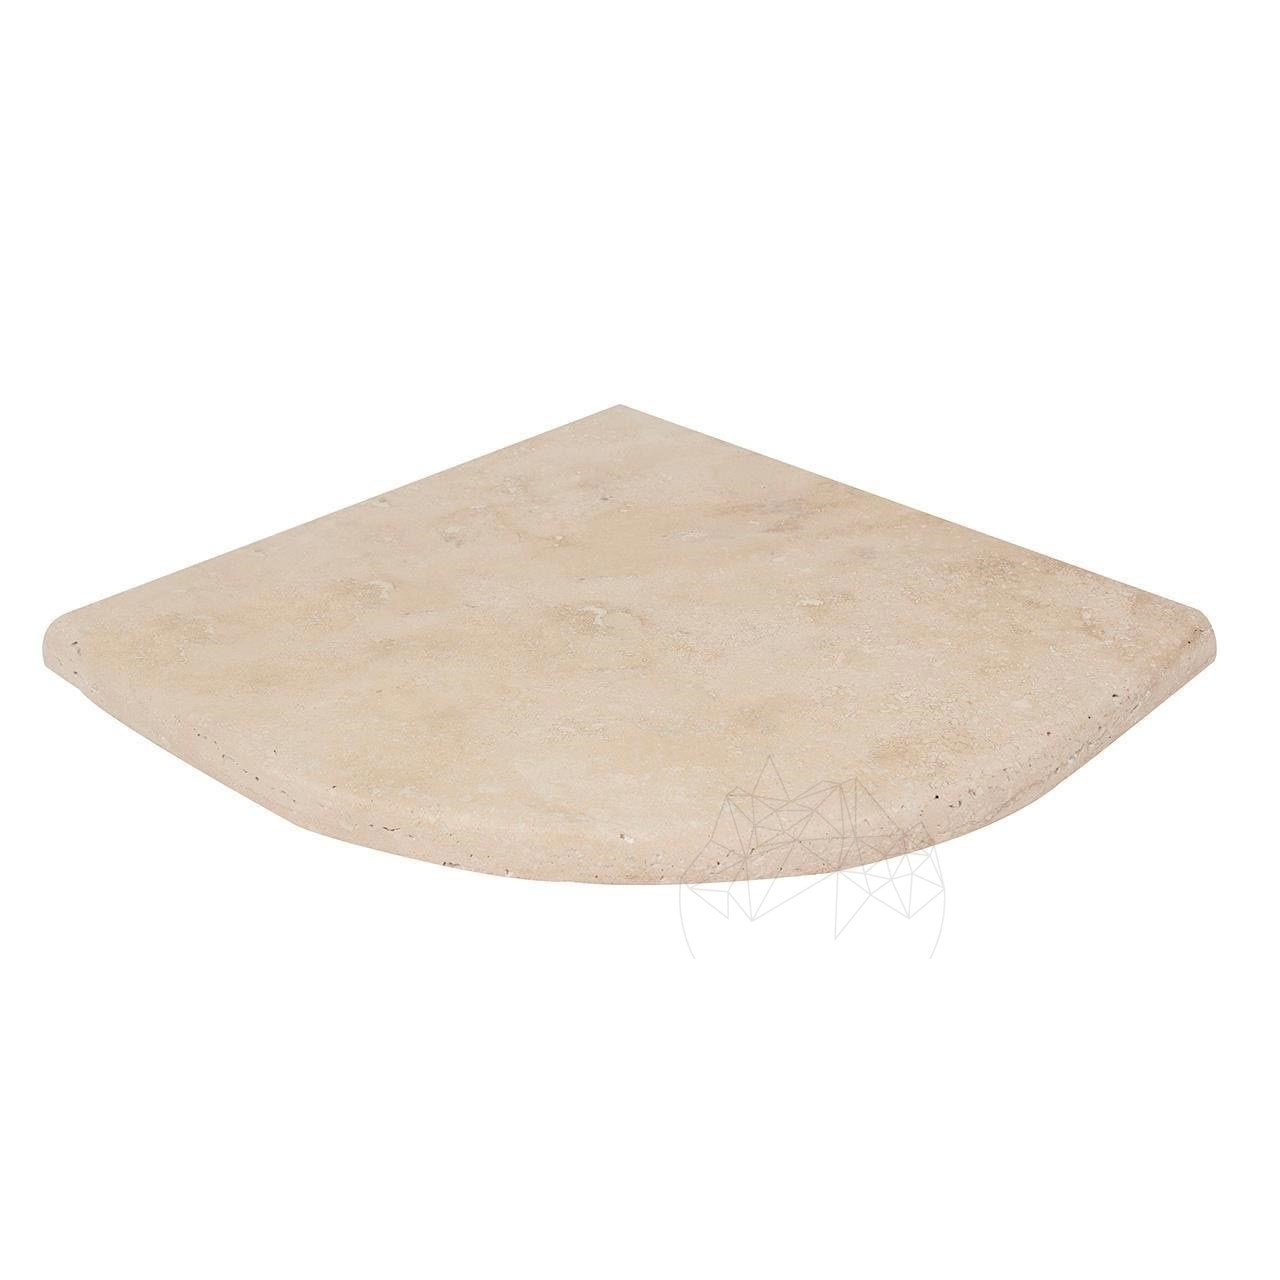 Etajera/Raft travertin classic - semirotund - 20 x 20 x 2 cm - 4396445 big - Etajera/Raft travertin classic – semirotund – 20 x 20 x 2 cm